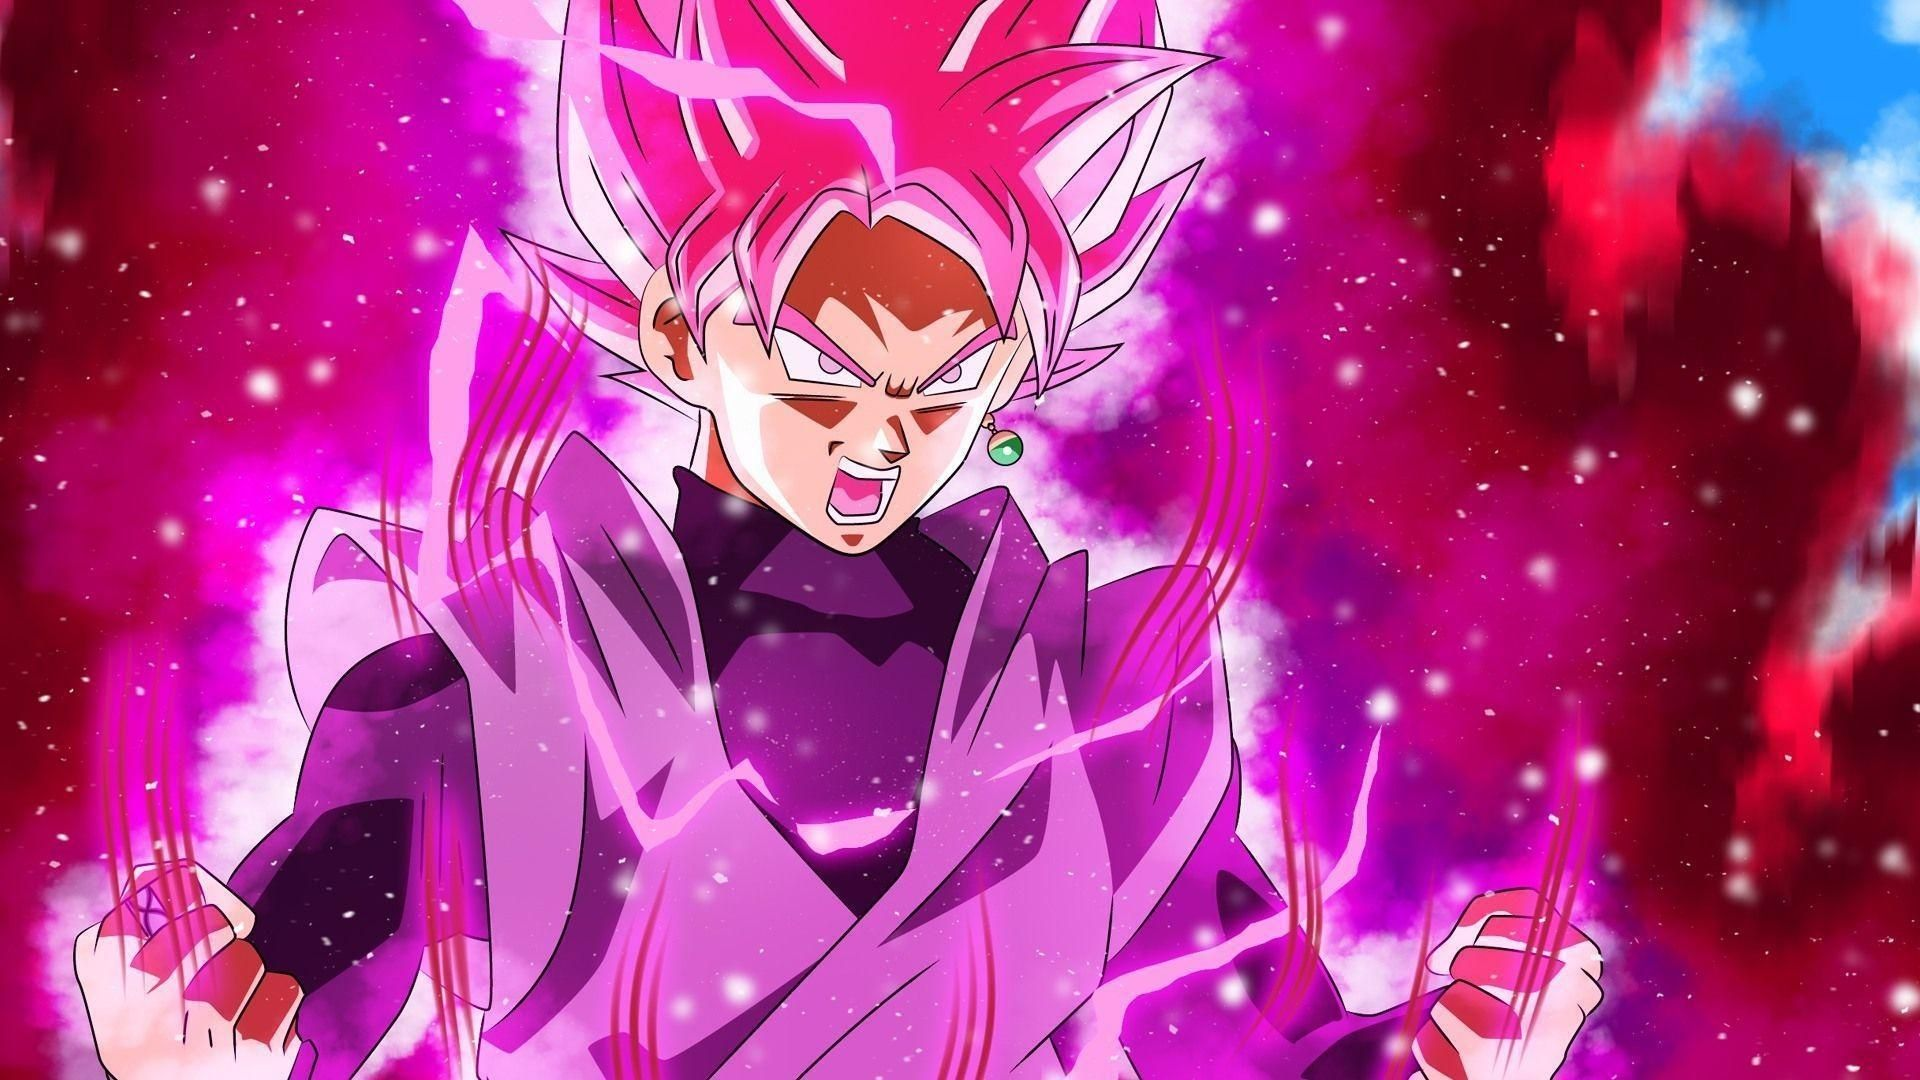 Goku And Goku Black Wallpapers Top Free Goku And Goku Black Backgrounds Wallpaperaccess